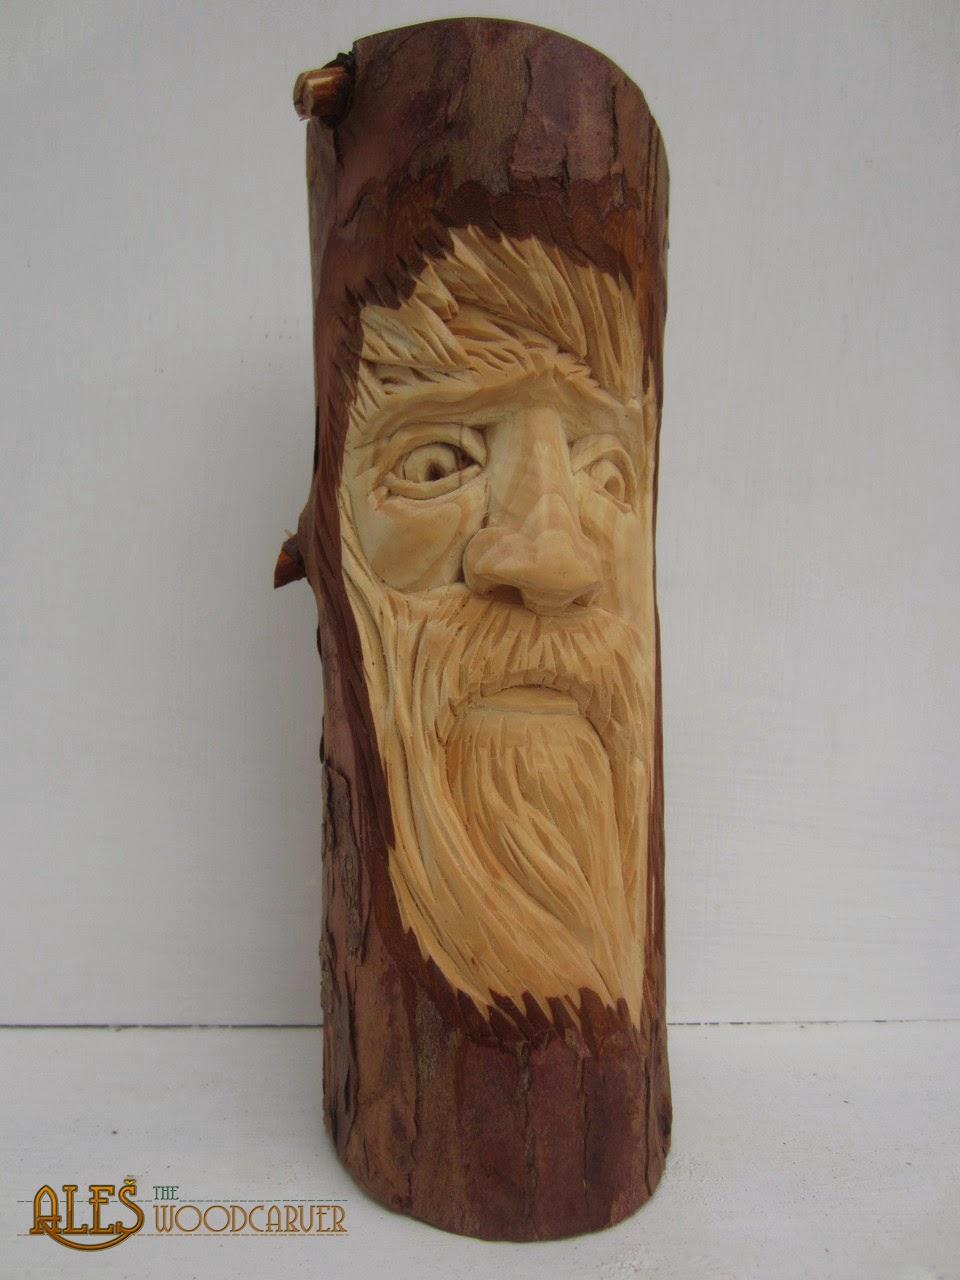 Ales the woodcarver wood spirits